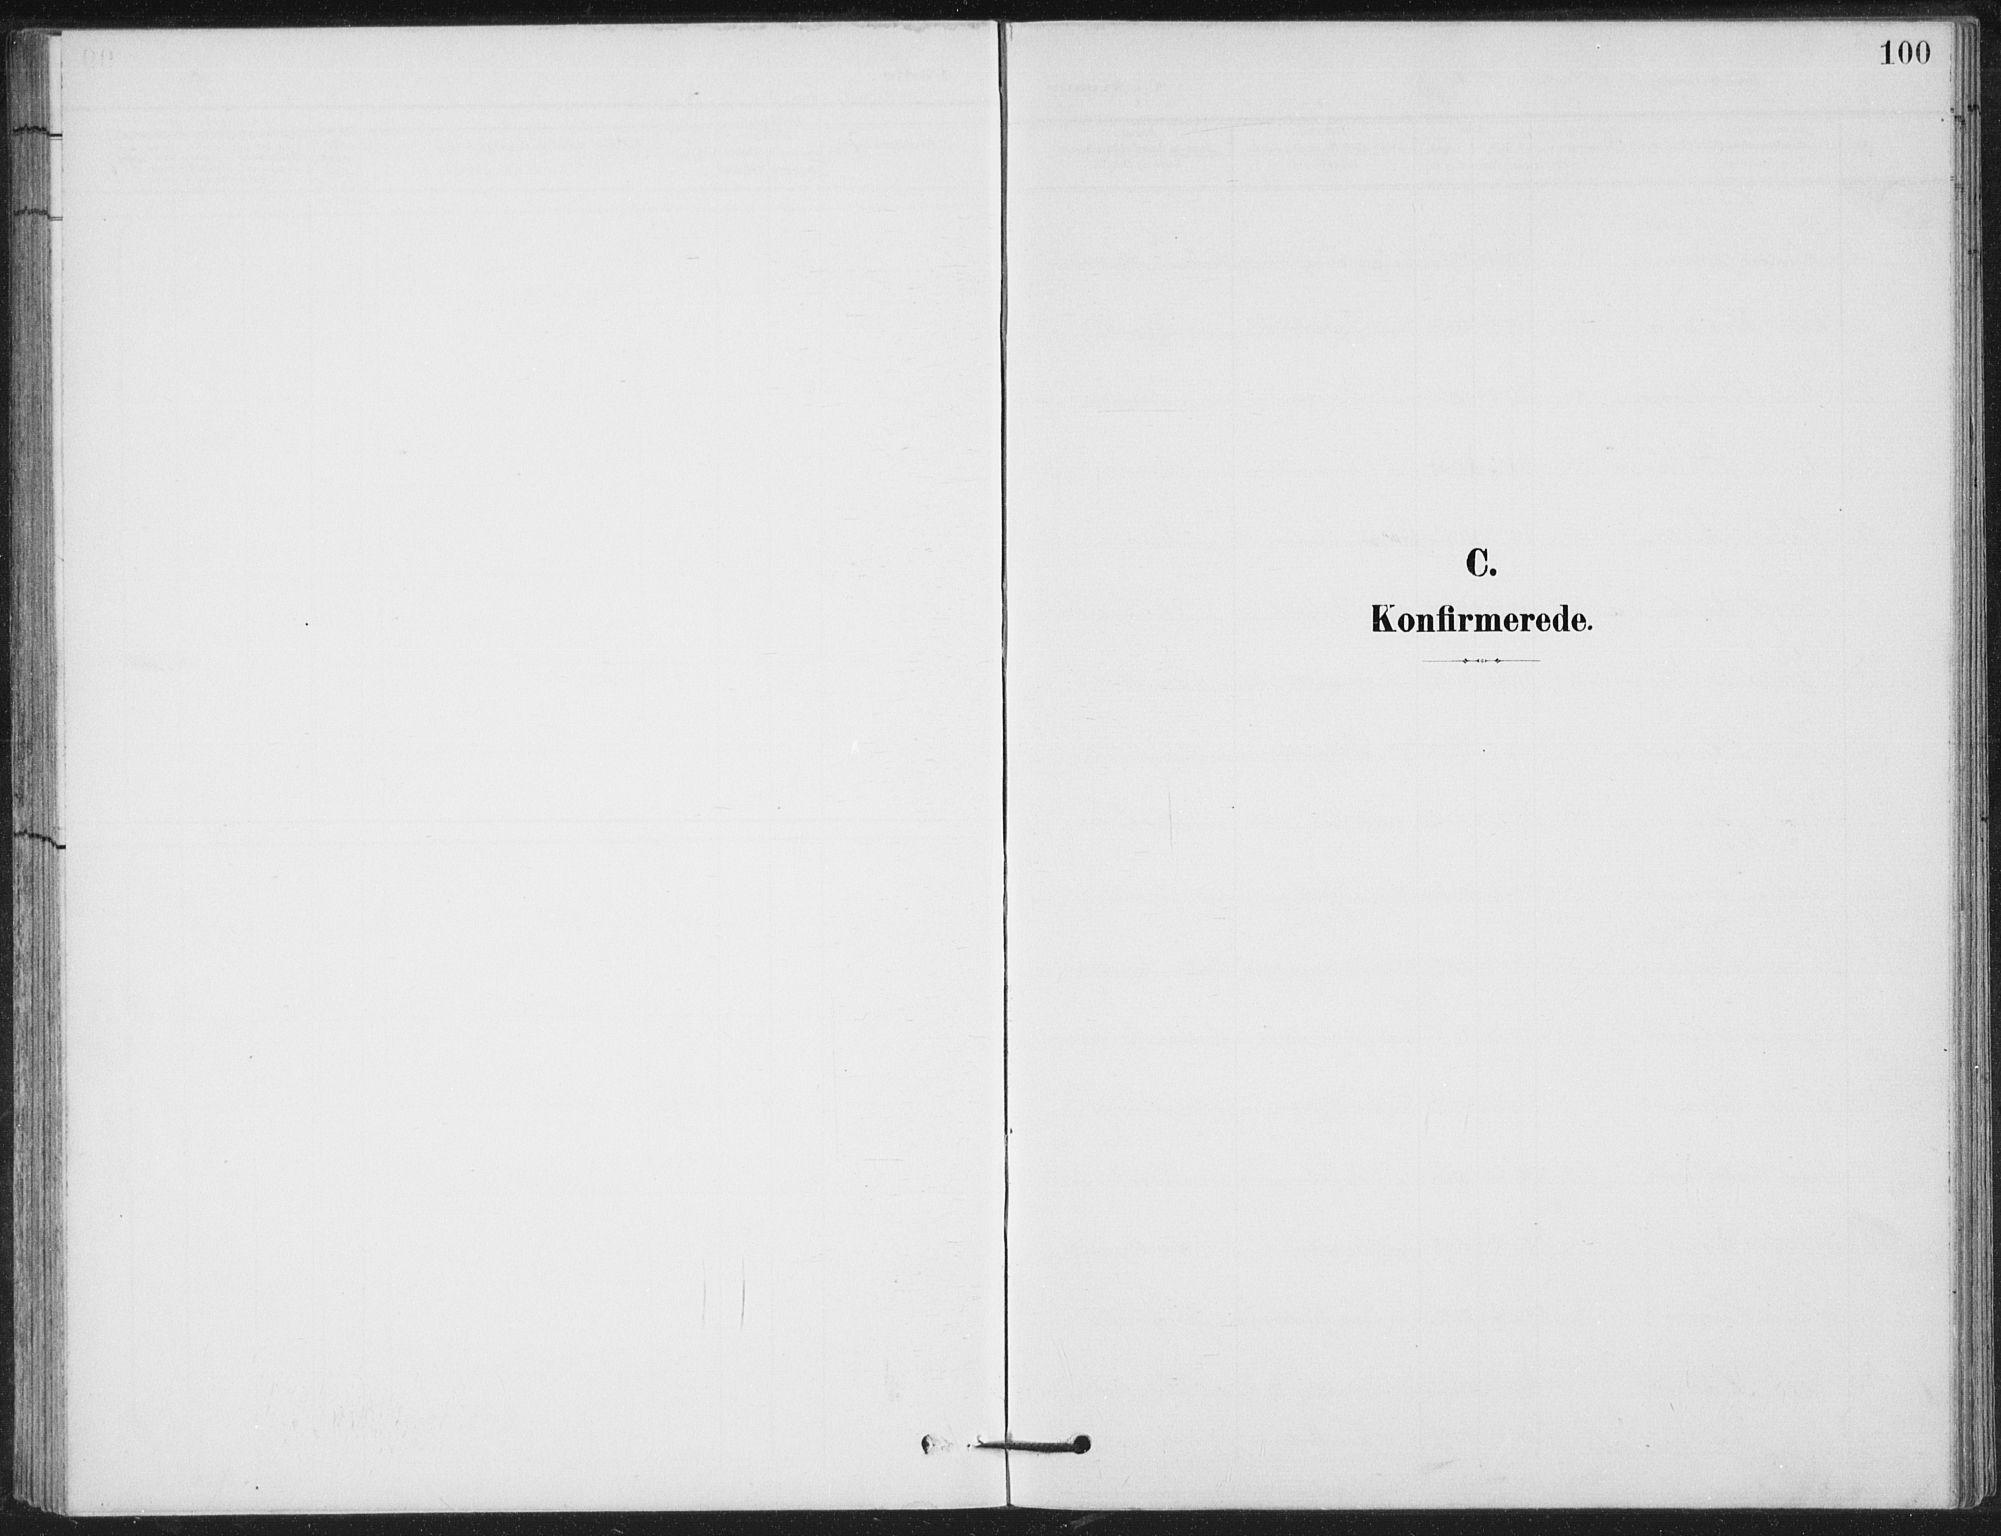 SAH, Vestre Gausdal prestekontor, Klokkerbok nr. 4, 1898-1939, s. 100